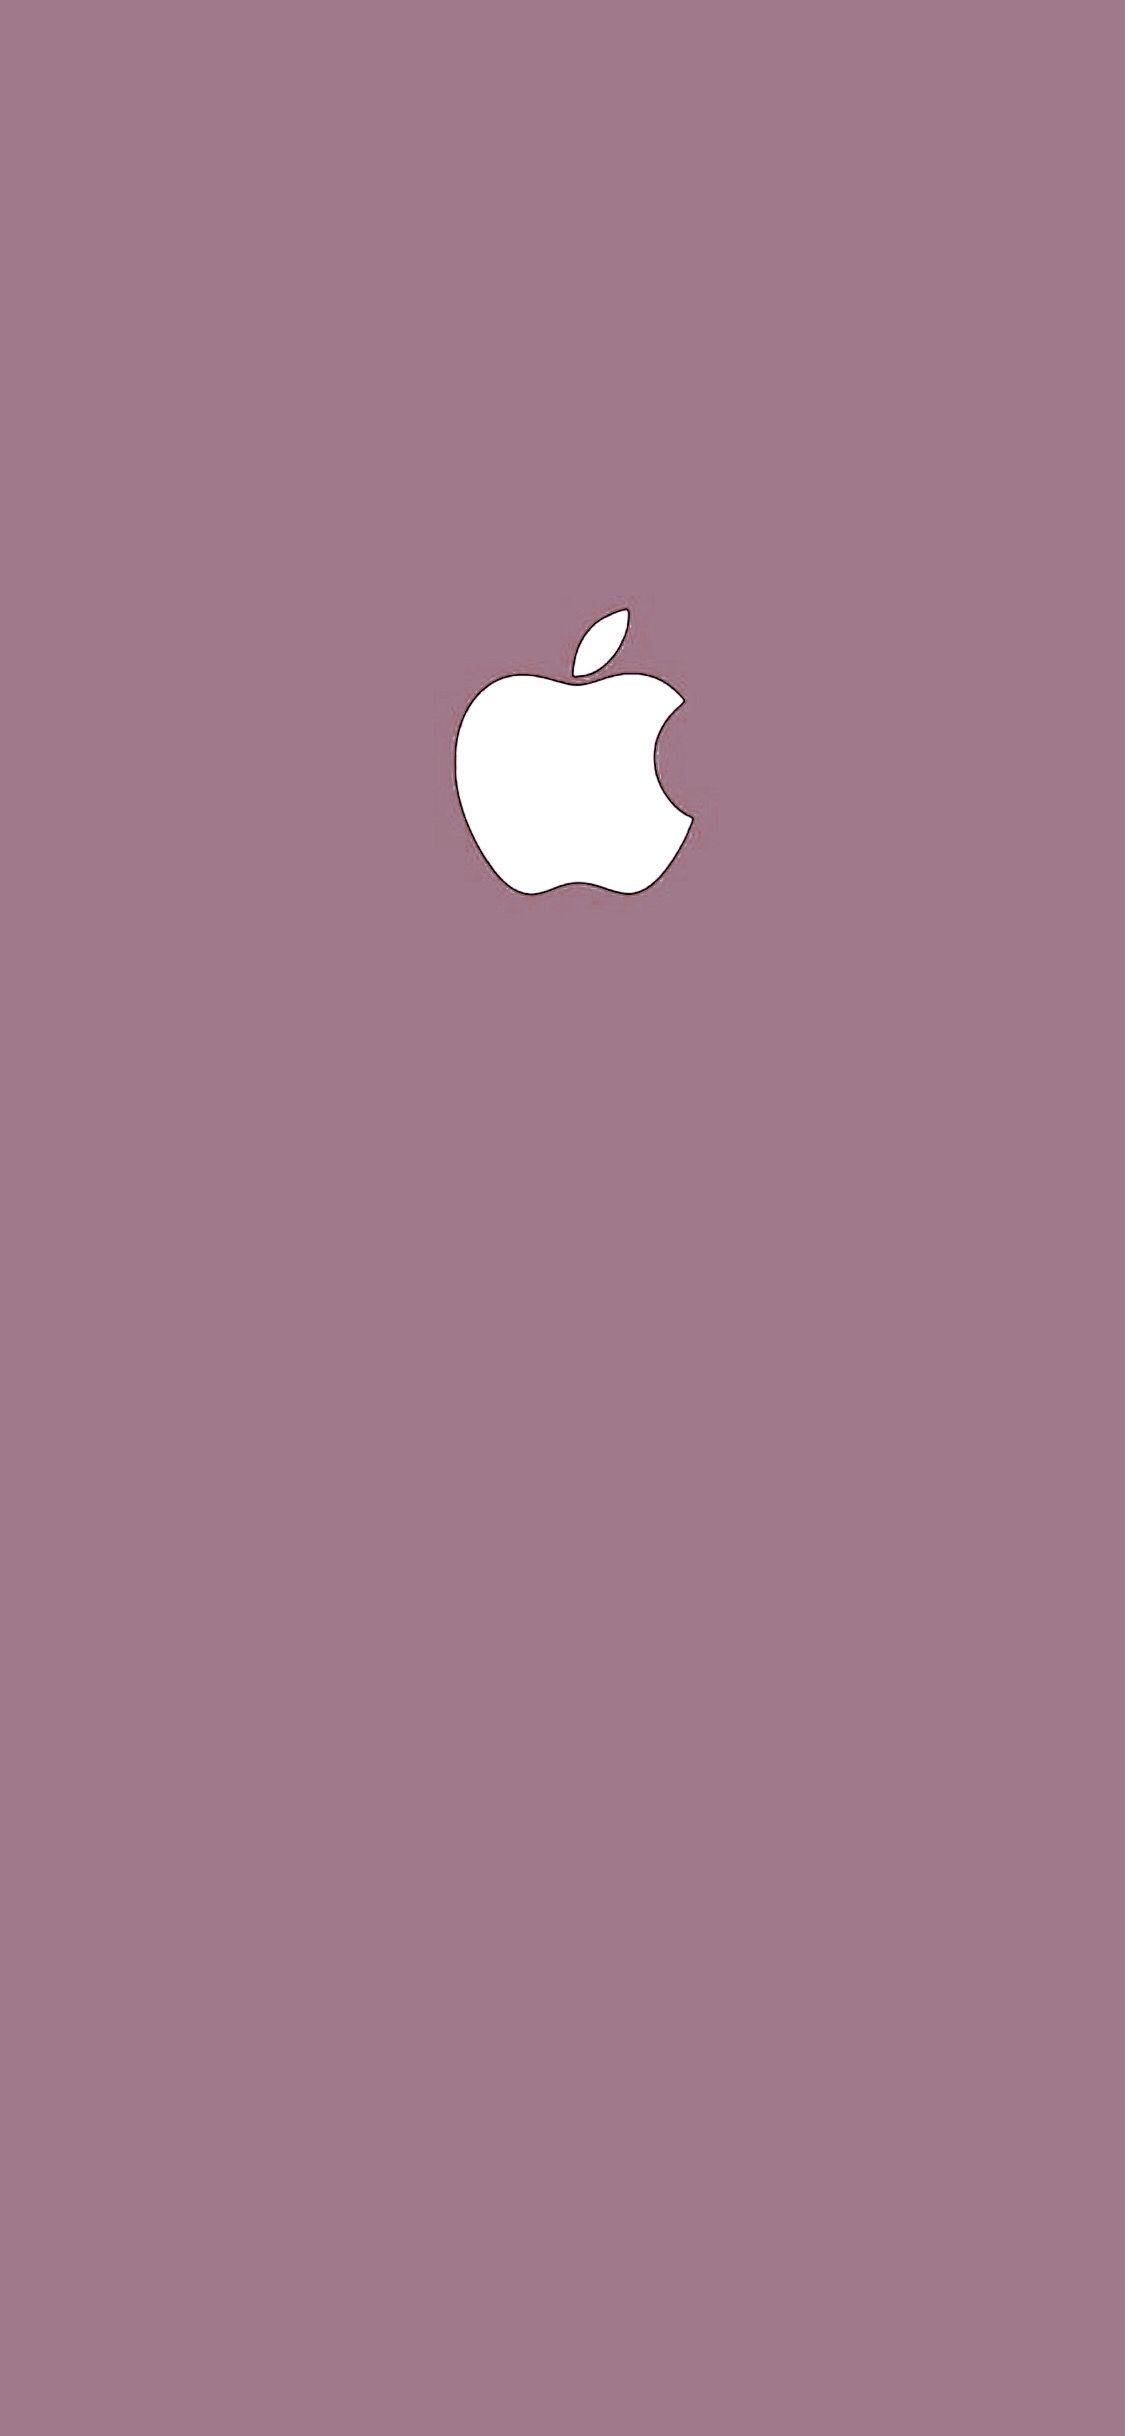 iOS13 iphonewallpaper apple logo colorful lockscreen